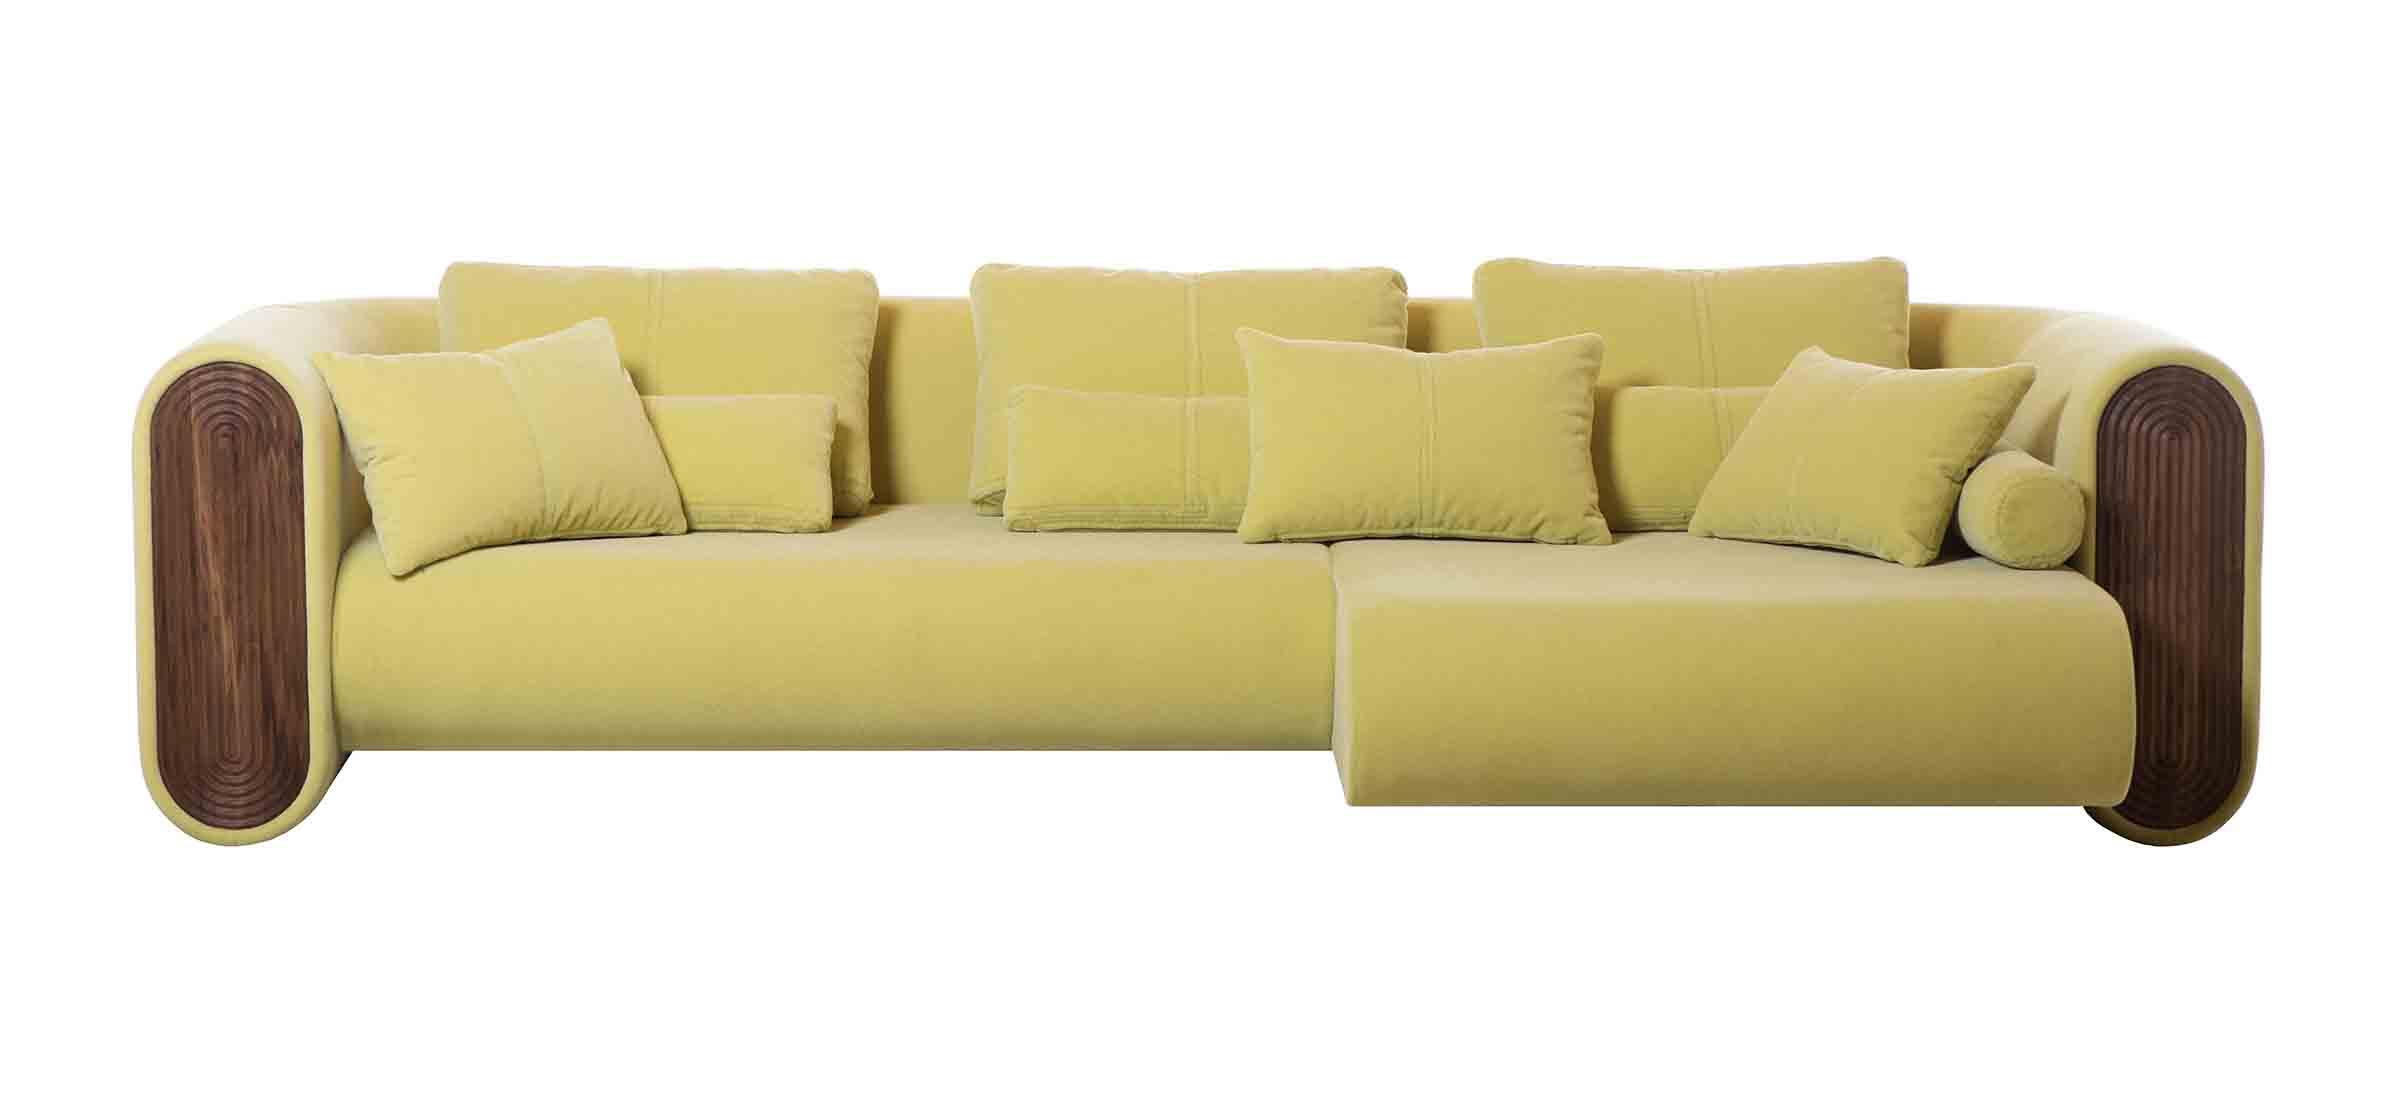 'Union' sofa, designed by Autoban for De La Espada